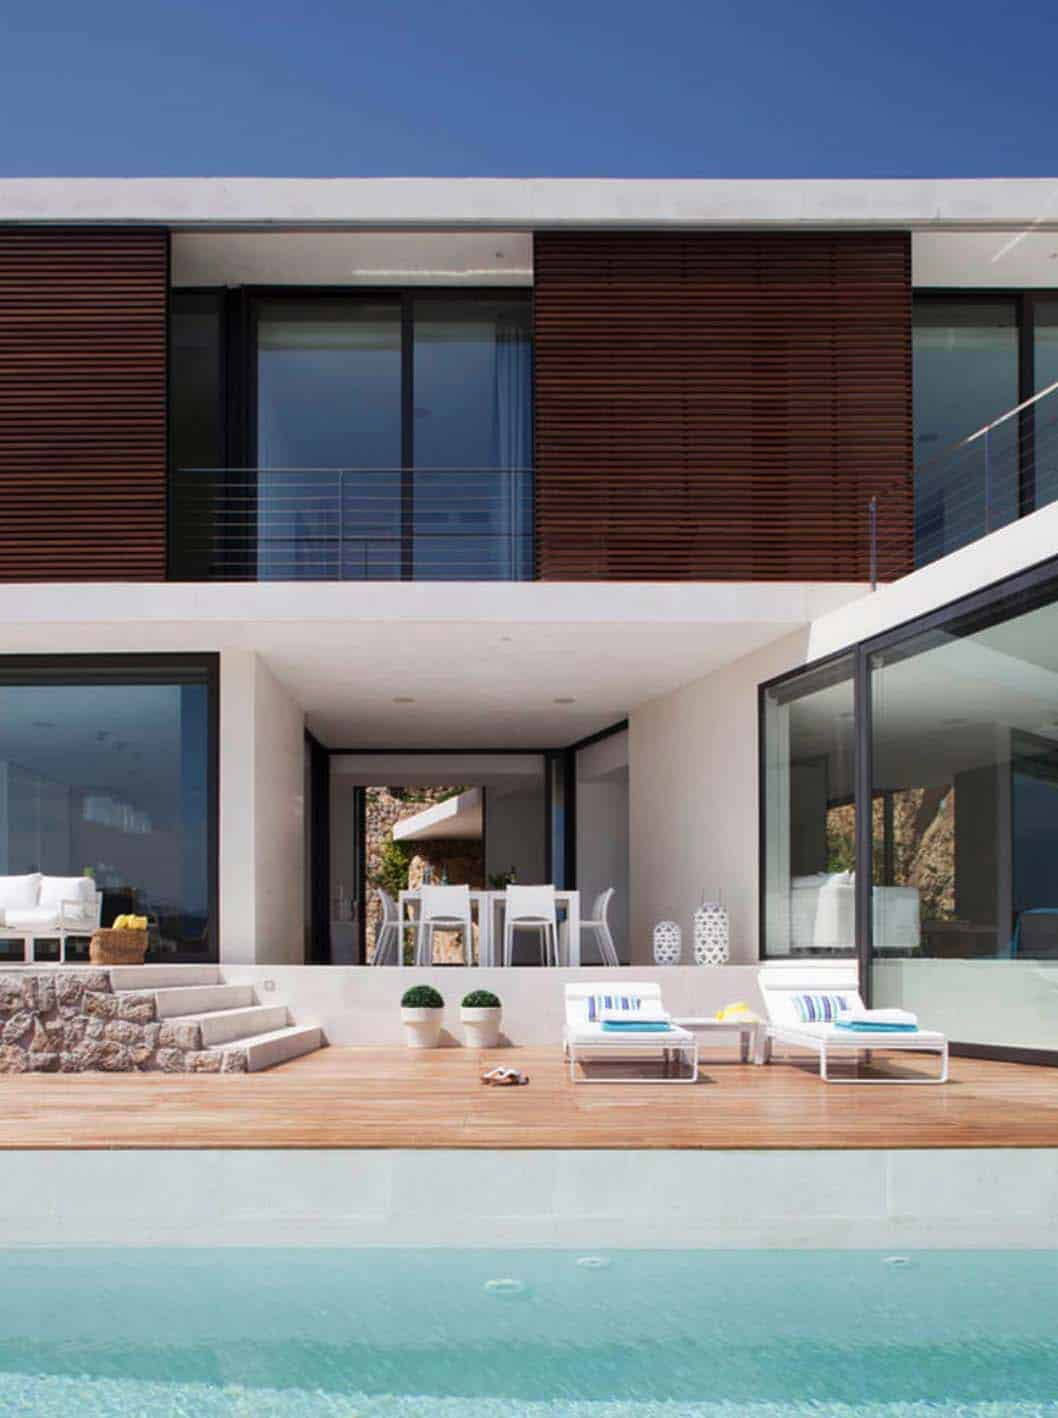 Contemporary Mountain House-Miquel Lacomba-11-1 Kindesign